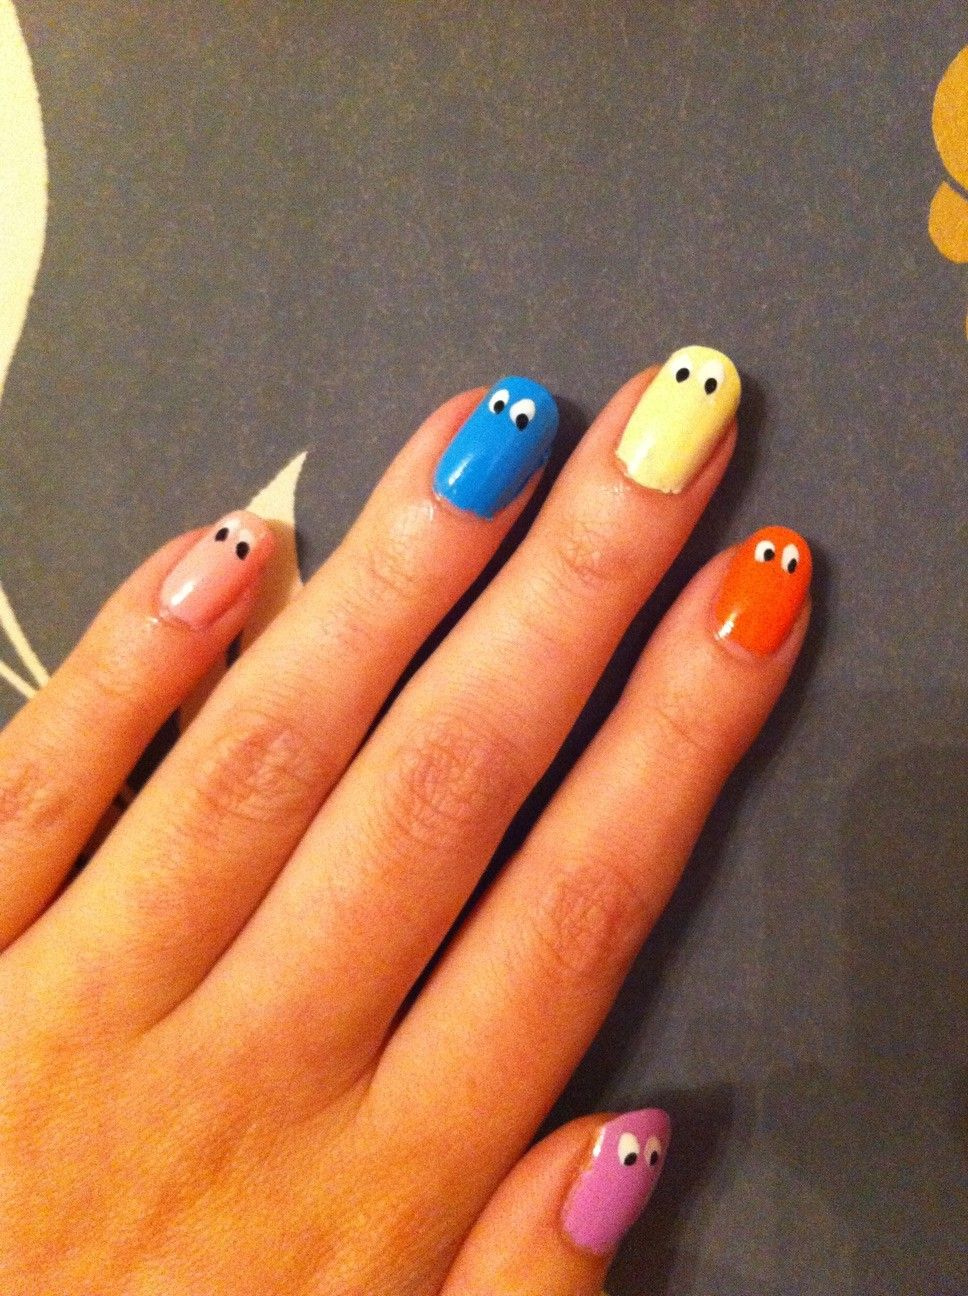 superhero nails - Google Search - Superhero Nails - Google Search Nails Pinterest Superhero